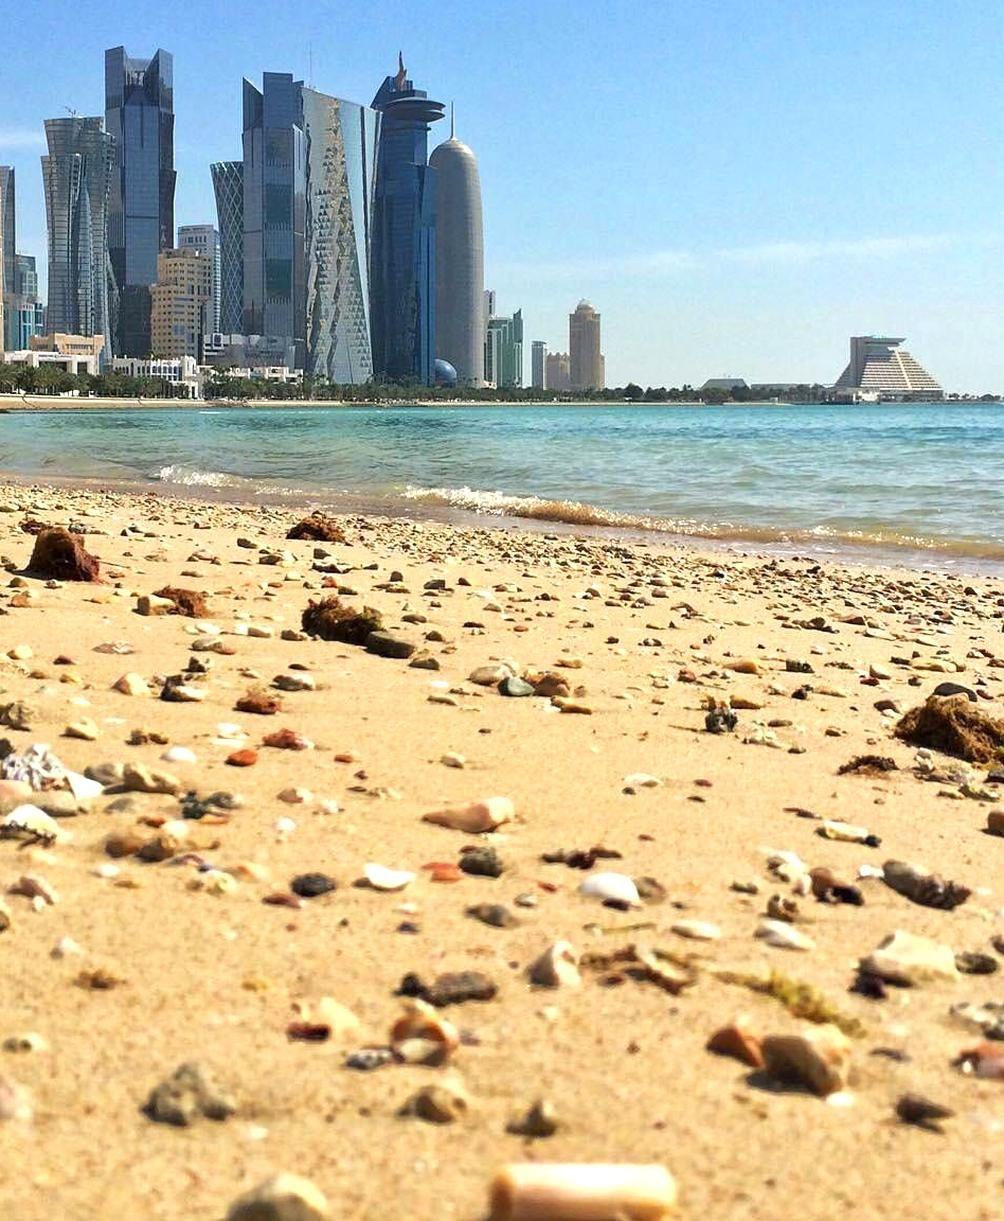 Corniche Doha Qatar Mirnamahyudin In 2020 Doha Beautiful Places Instagram